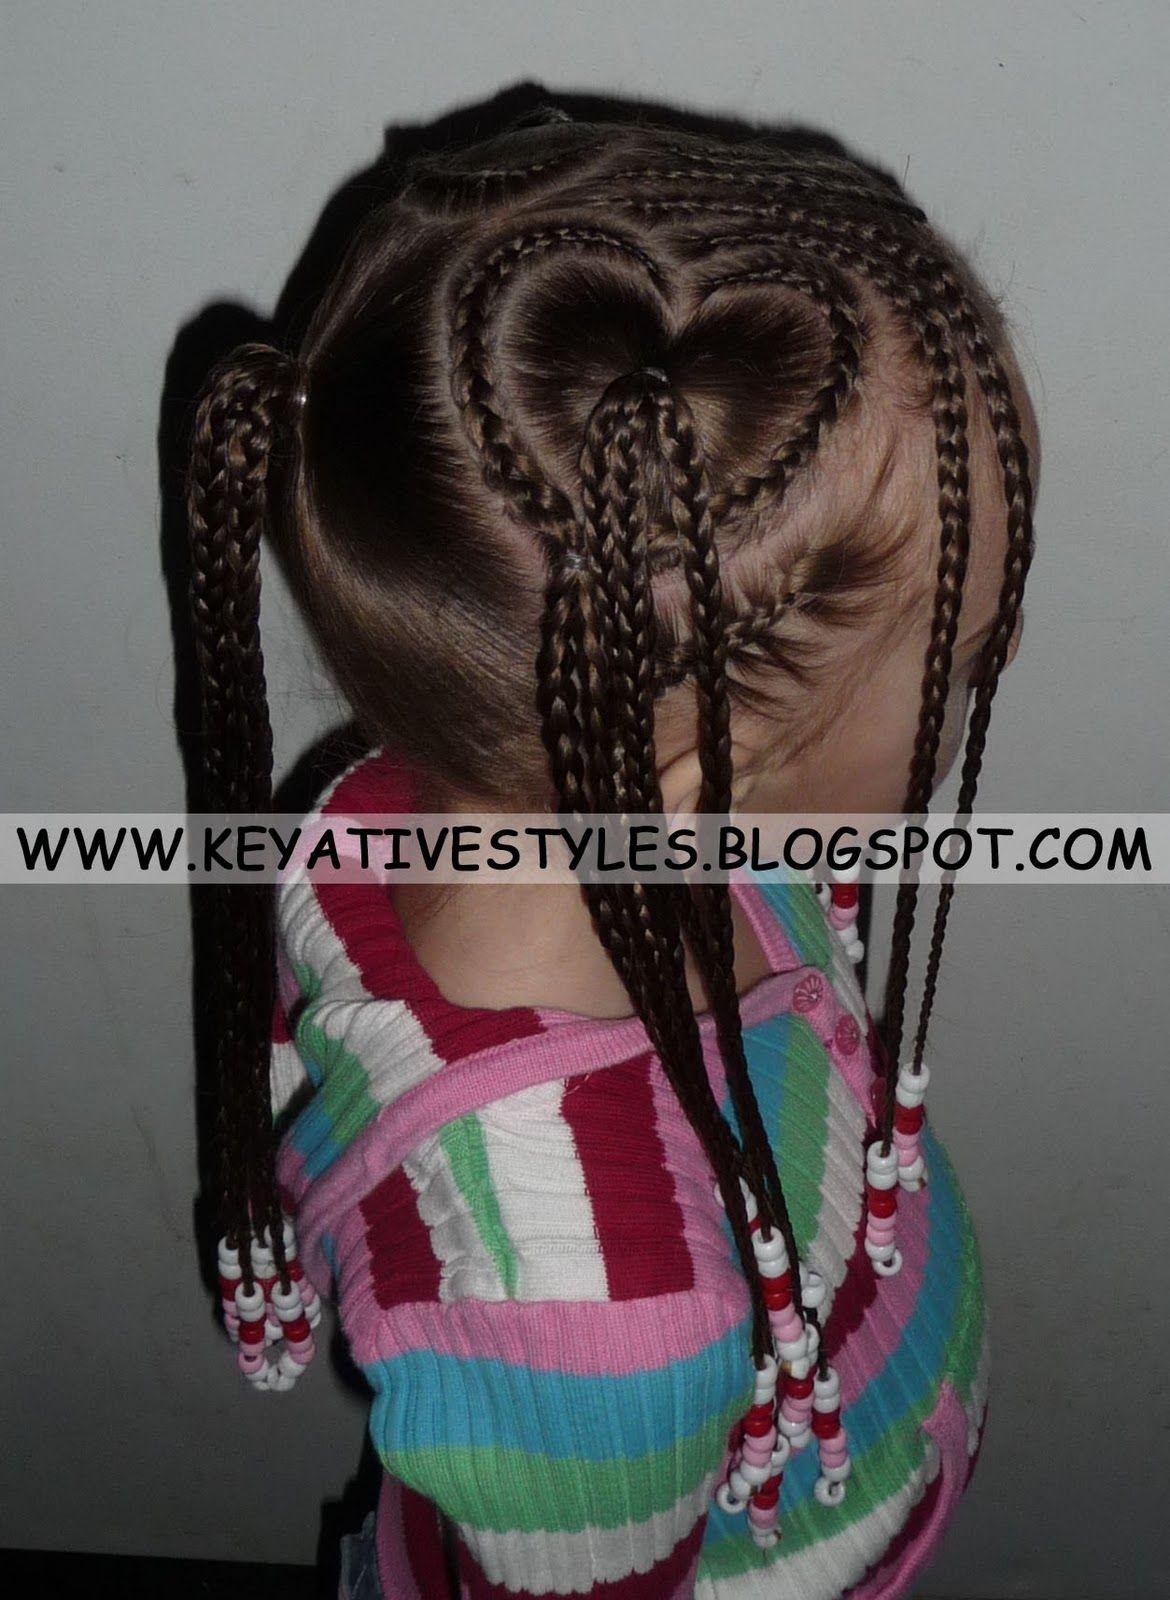 cornrow hairstyles for girls   keyative styles: heart shaped